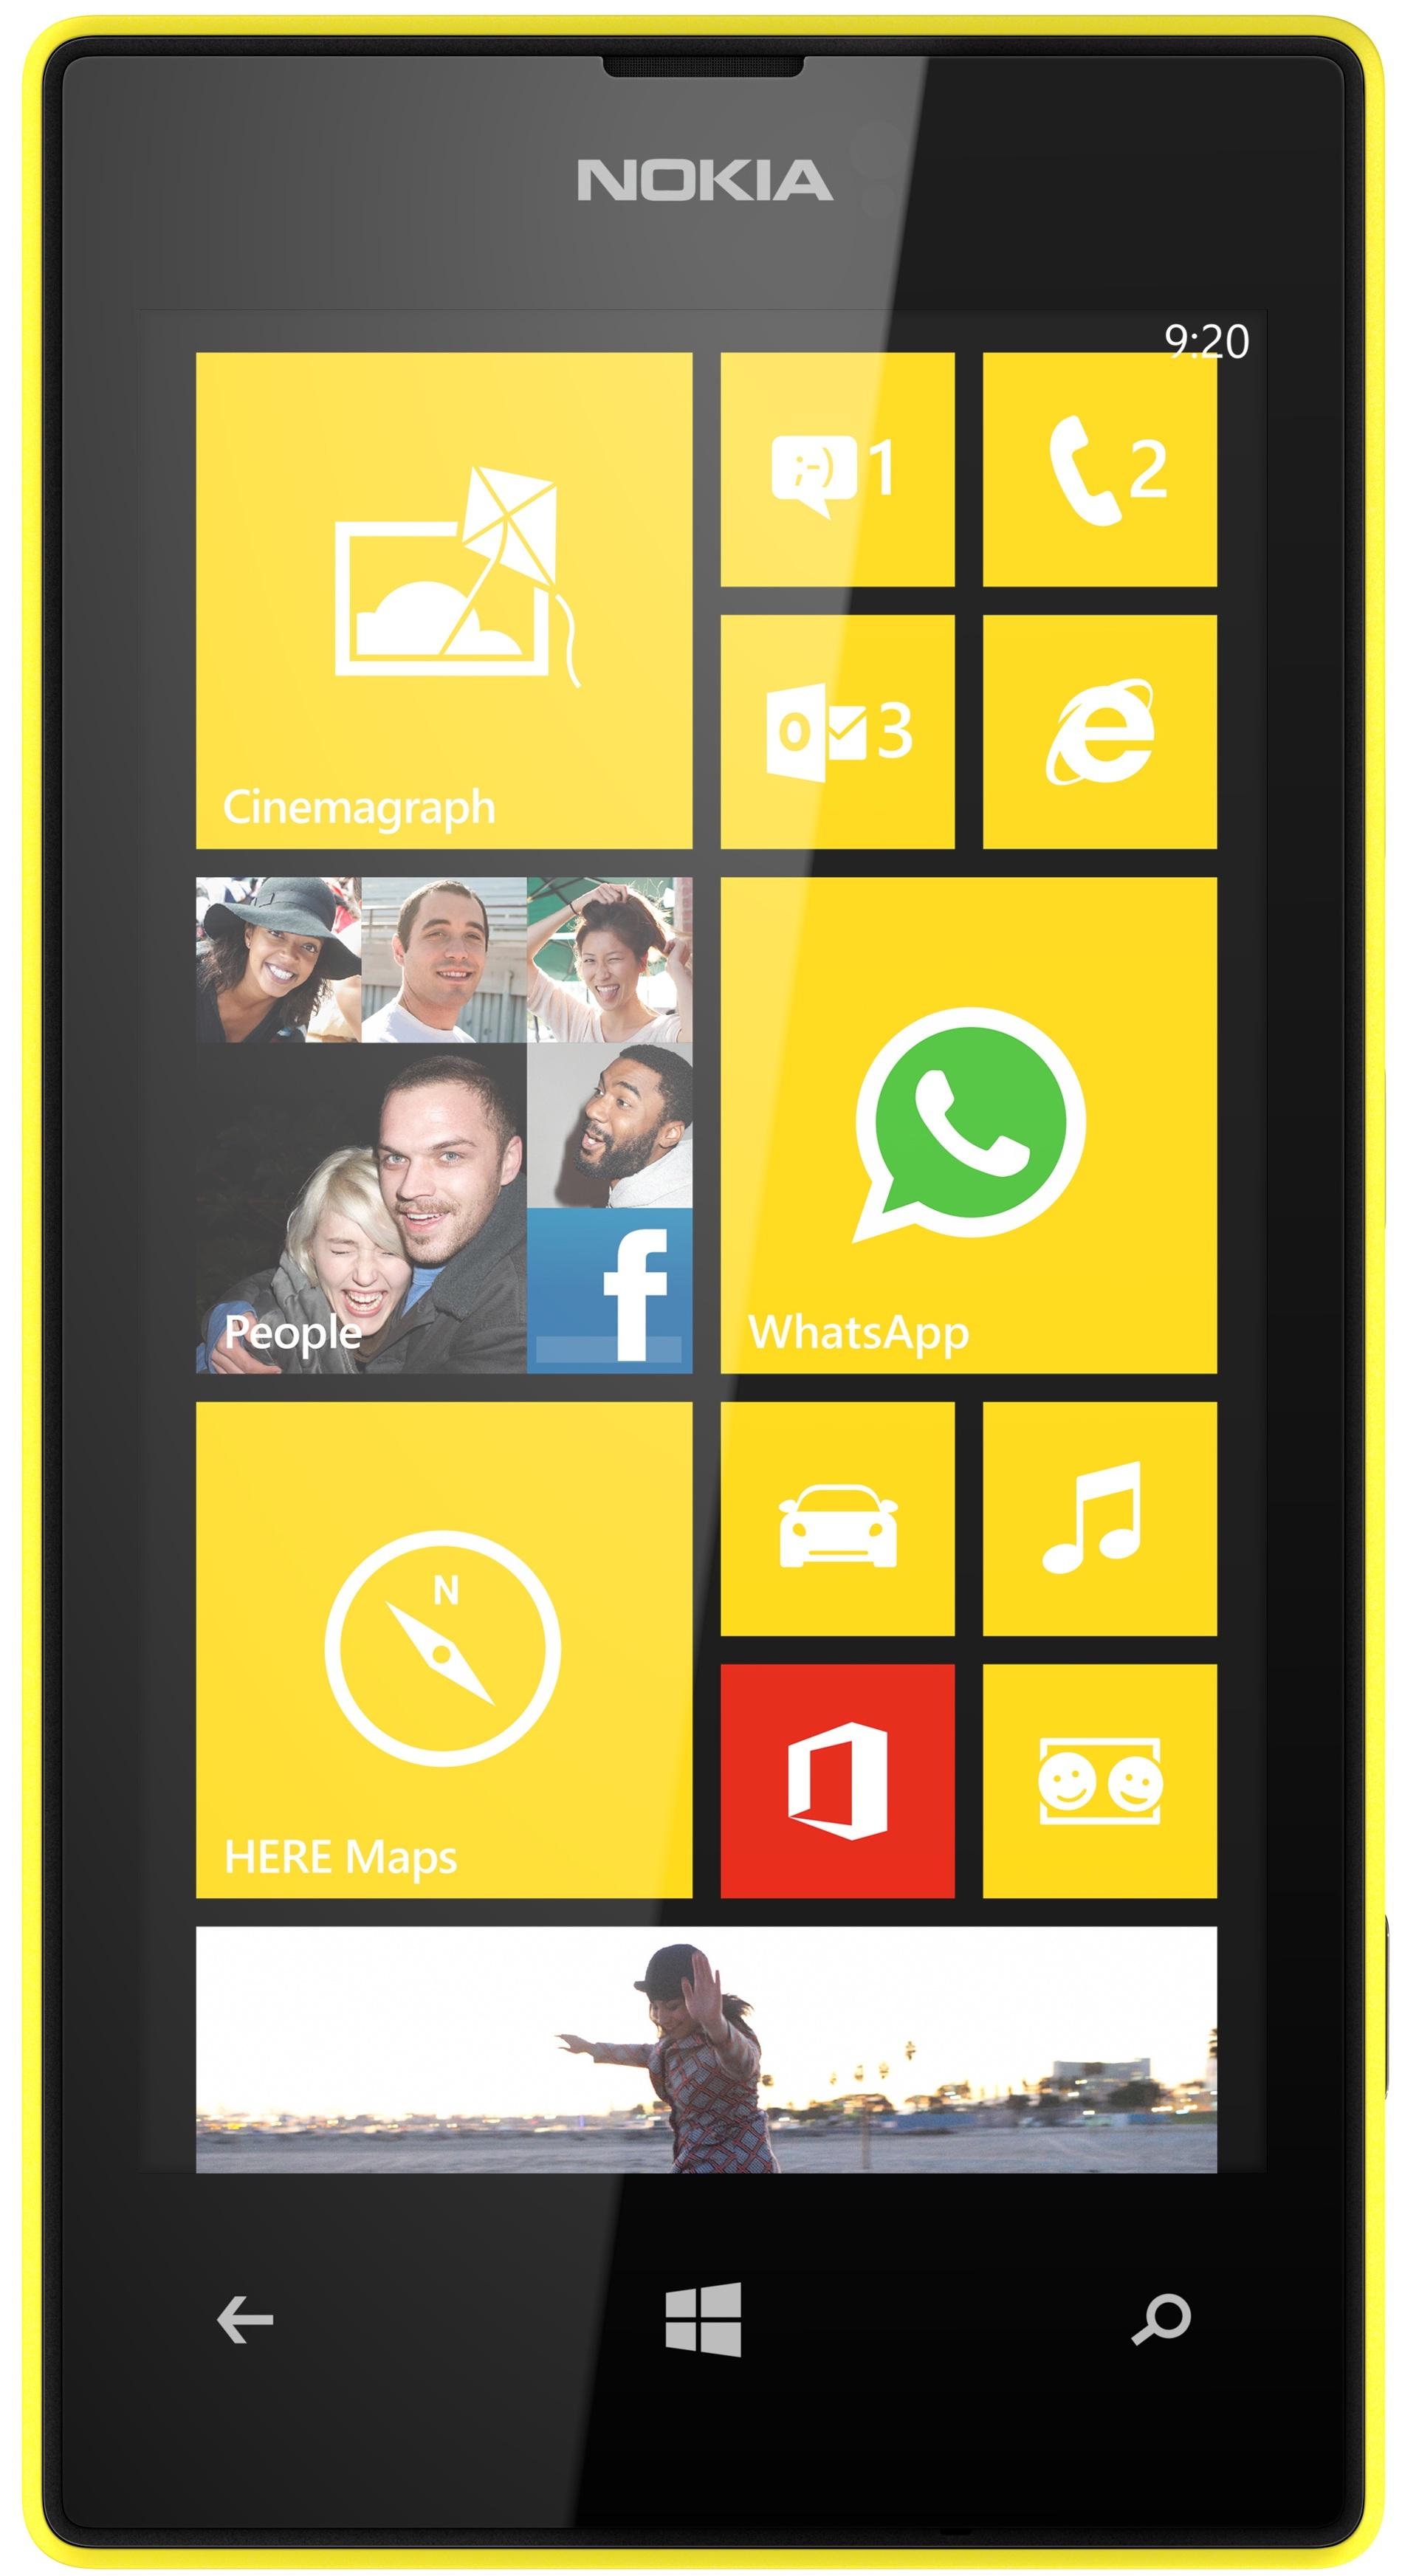 Offerta Nokia Lumia 520 su TrovaUsati.it